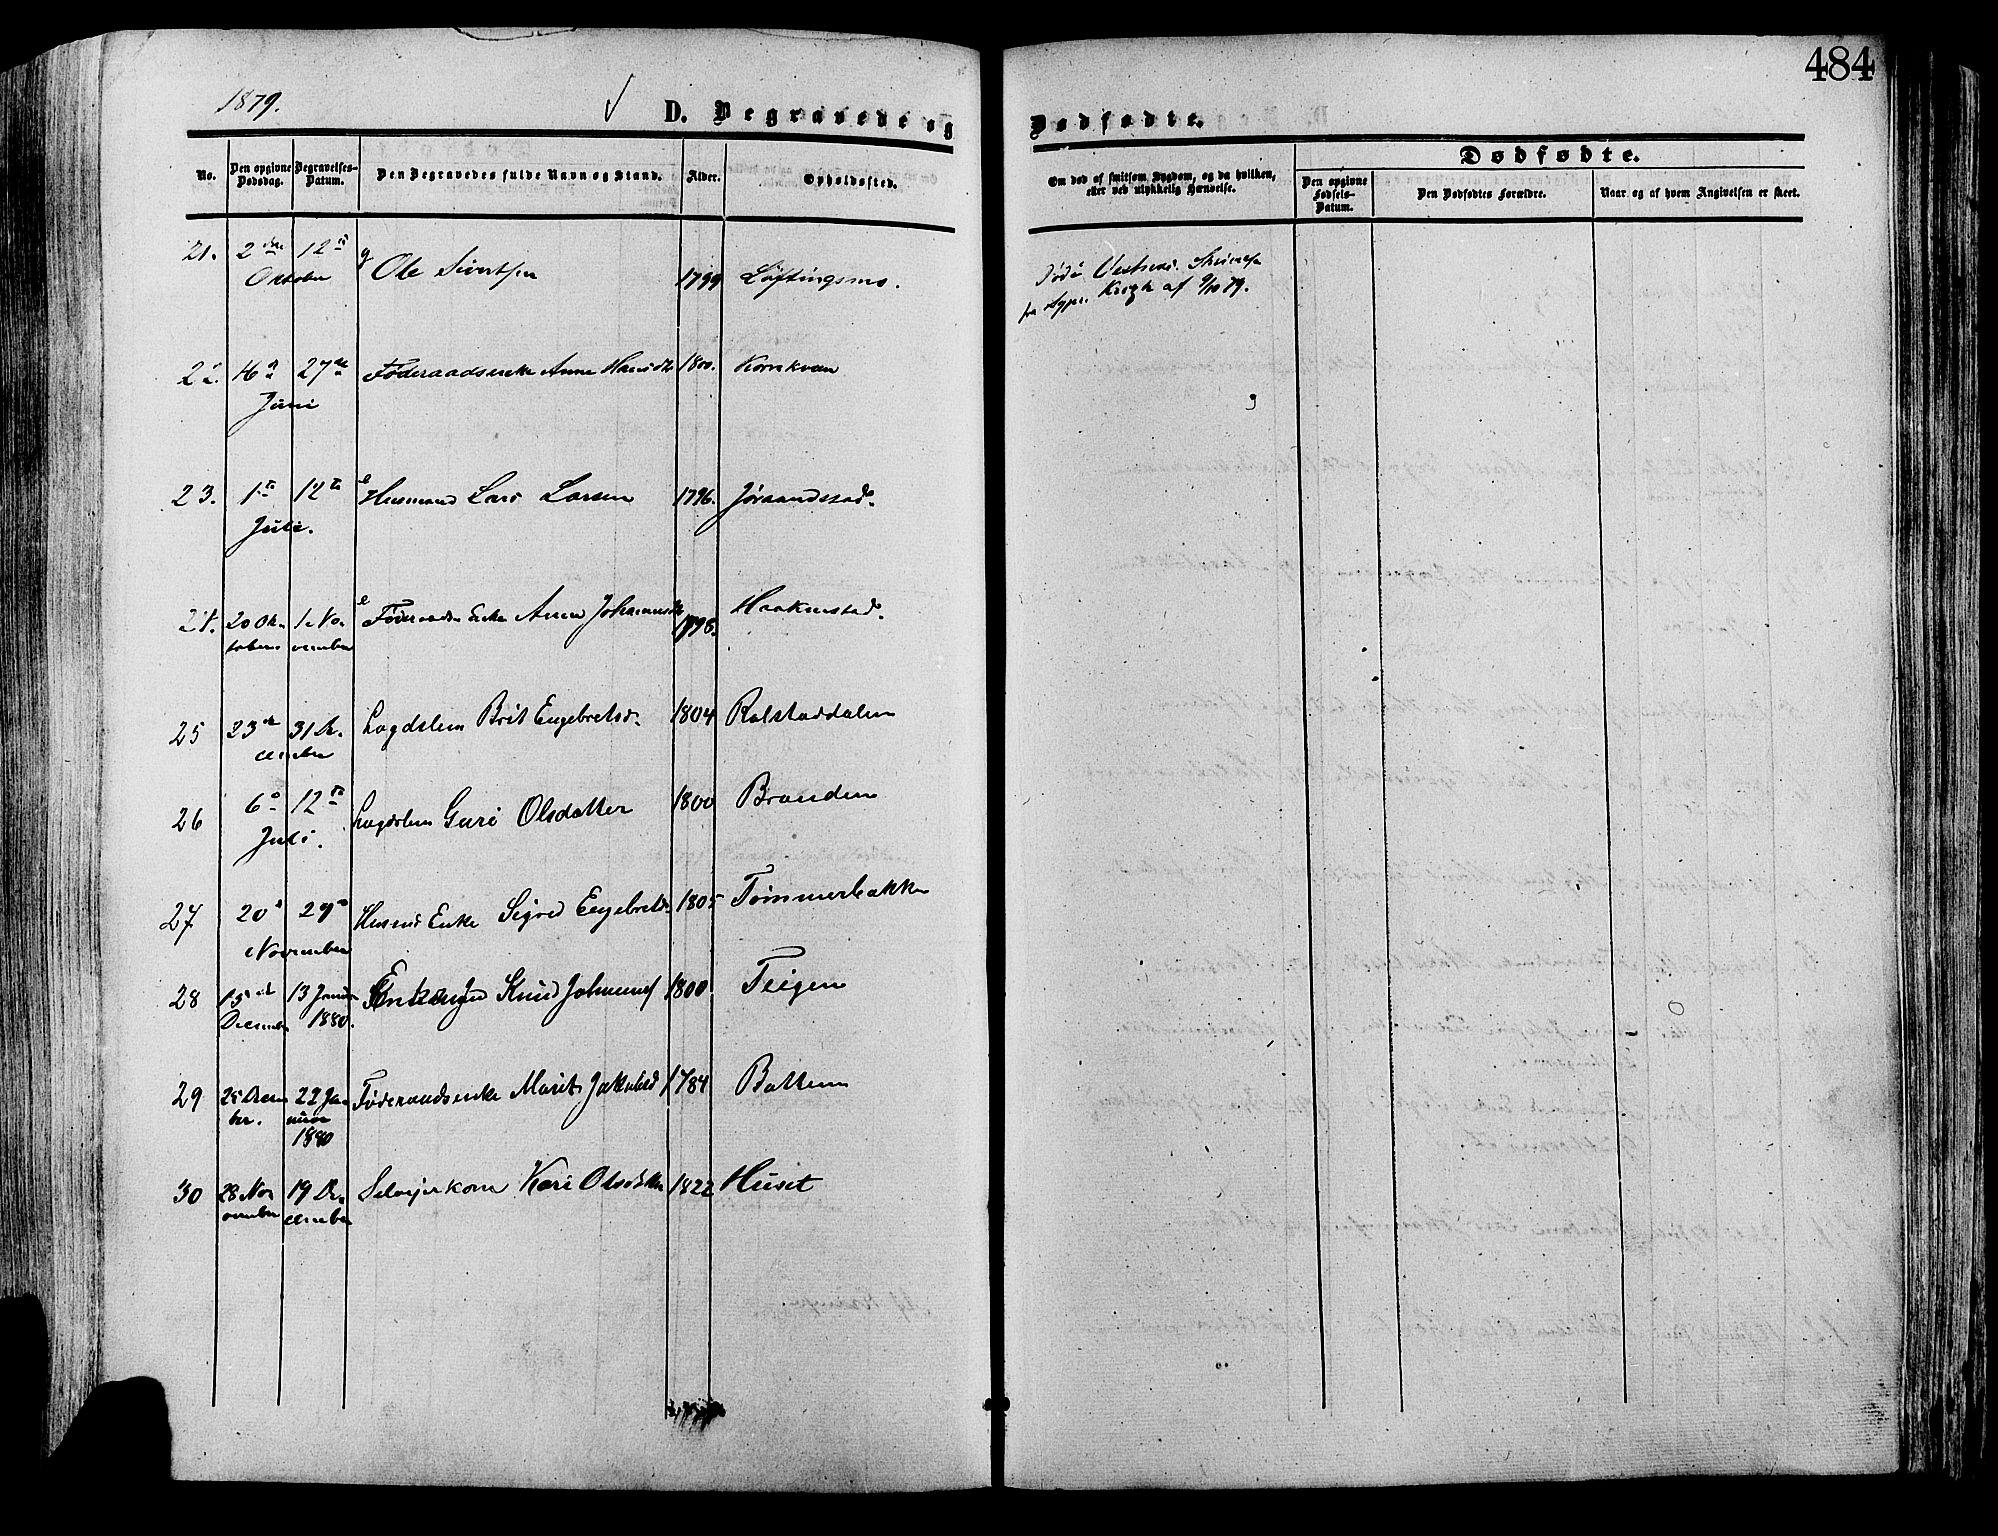 SAH, Lesja prestekontor, Ministerialbok nr. 8, 1854-1880, s. 484